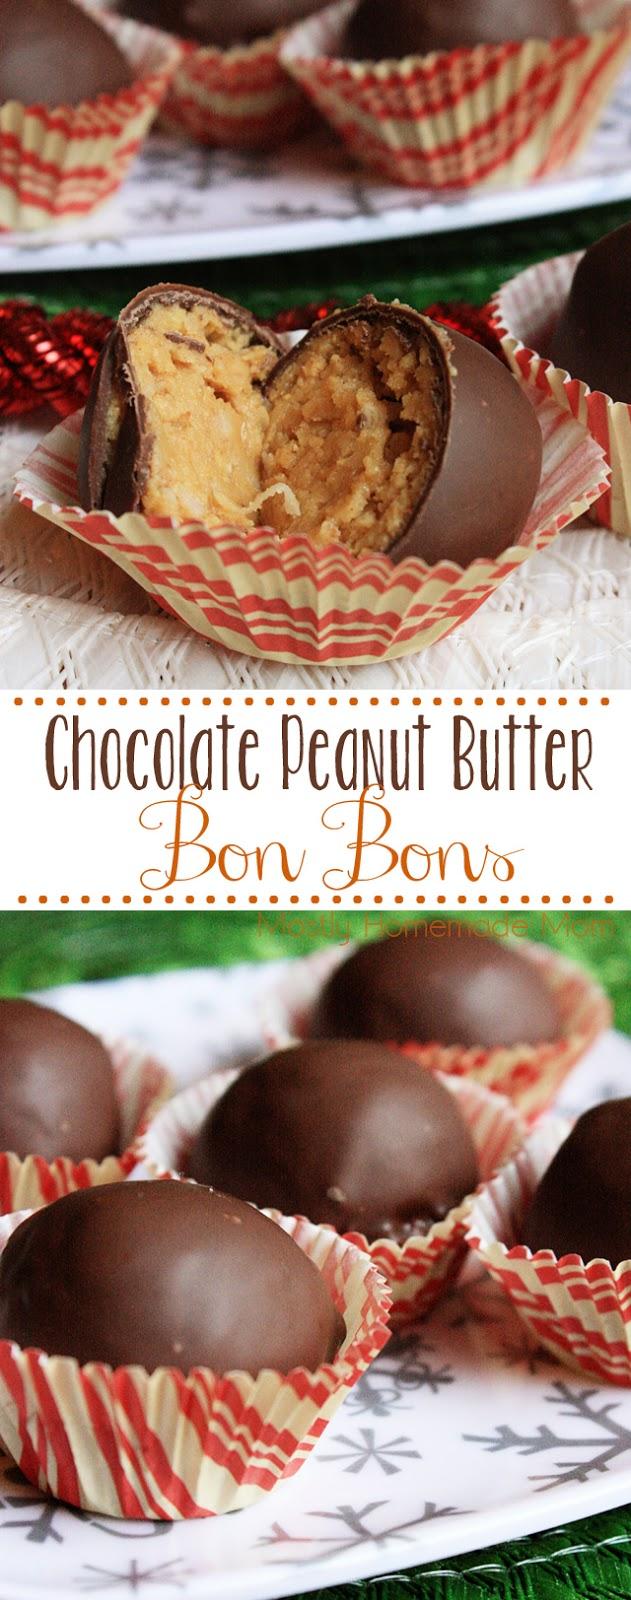 peanut butter chocolate bon bons recipe